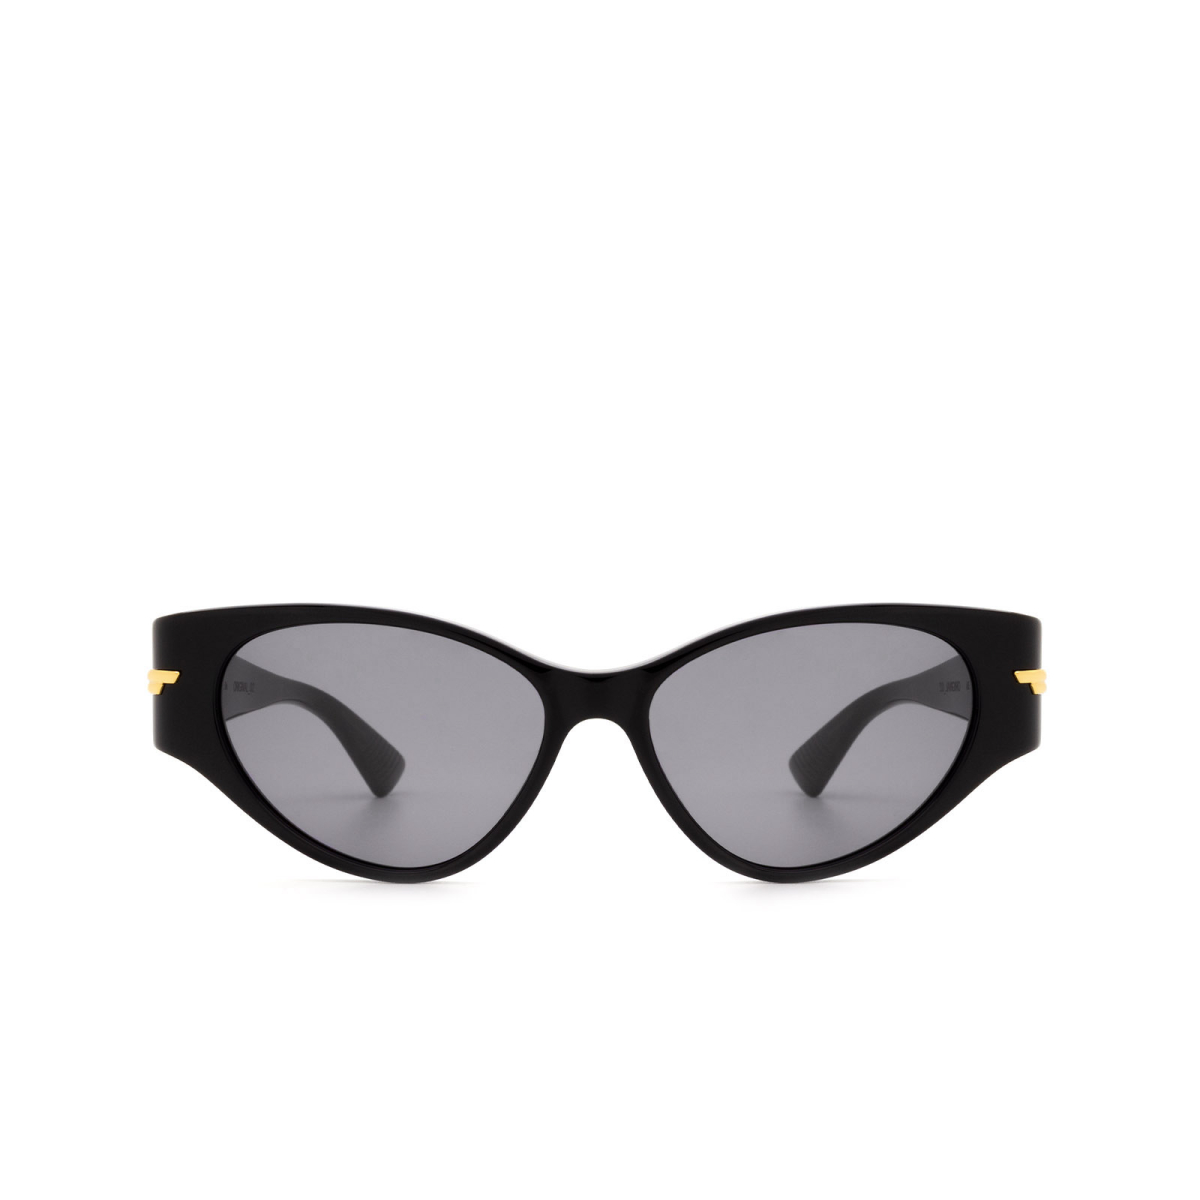 Bottega Veneta® Cat-eye Sunglasses: BV1002S color Black 001.